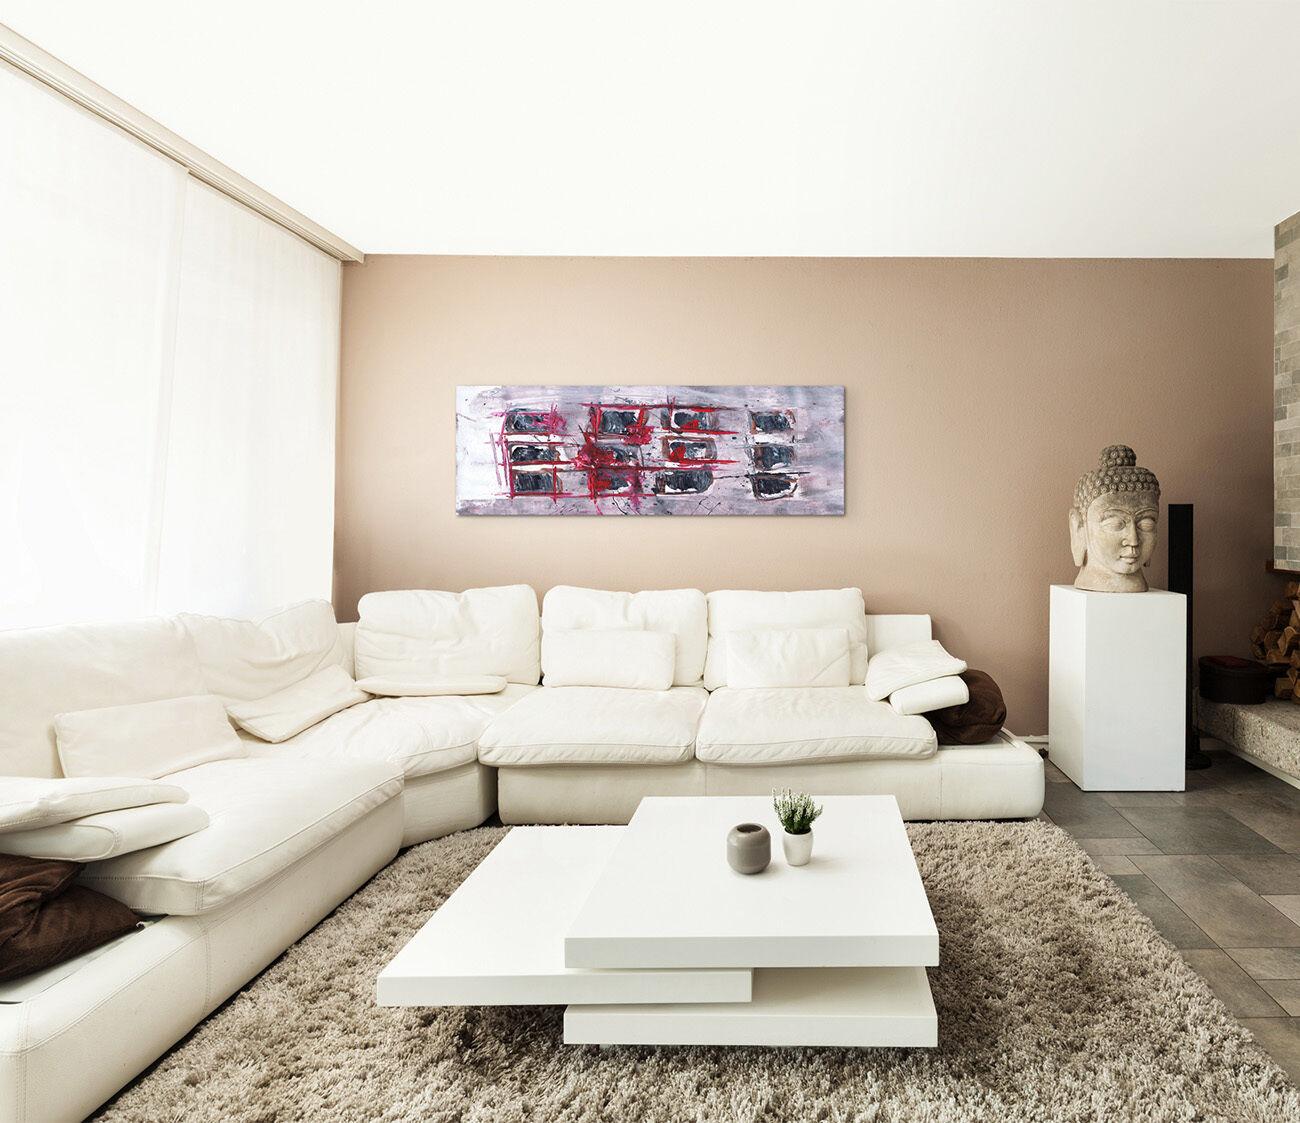 Leinwandbild panorama rot grau wei rosa paul sinus abstrakt 568 150x50cm eur 43 00 picclick de - Leinwandbild grau ...